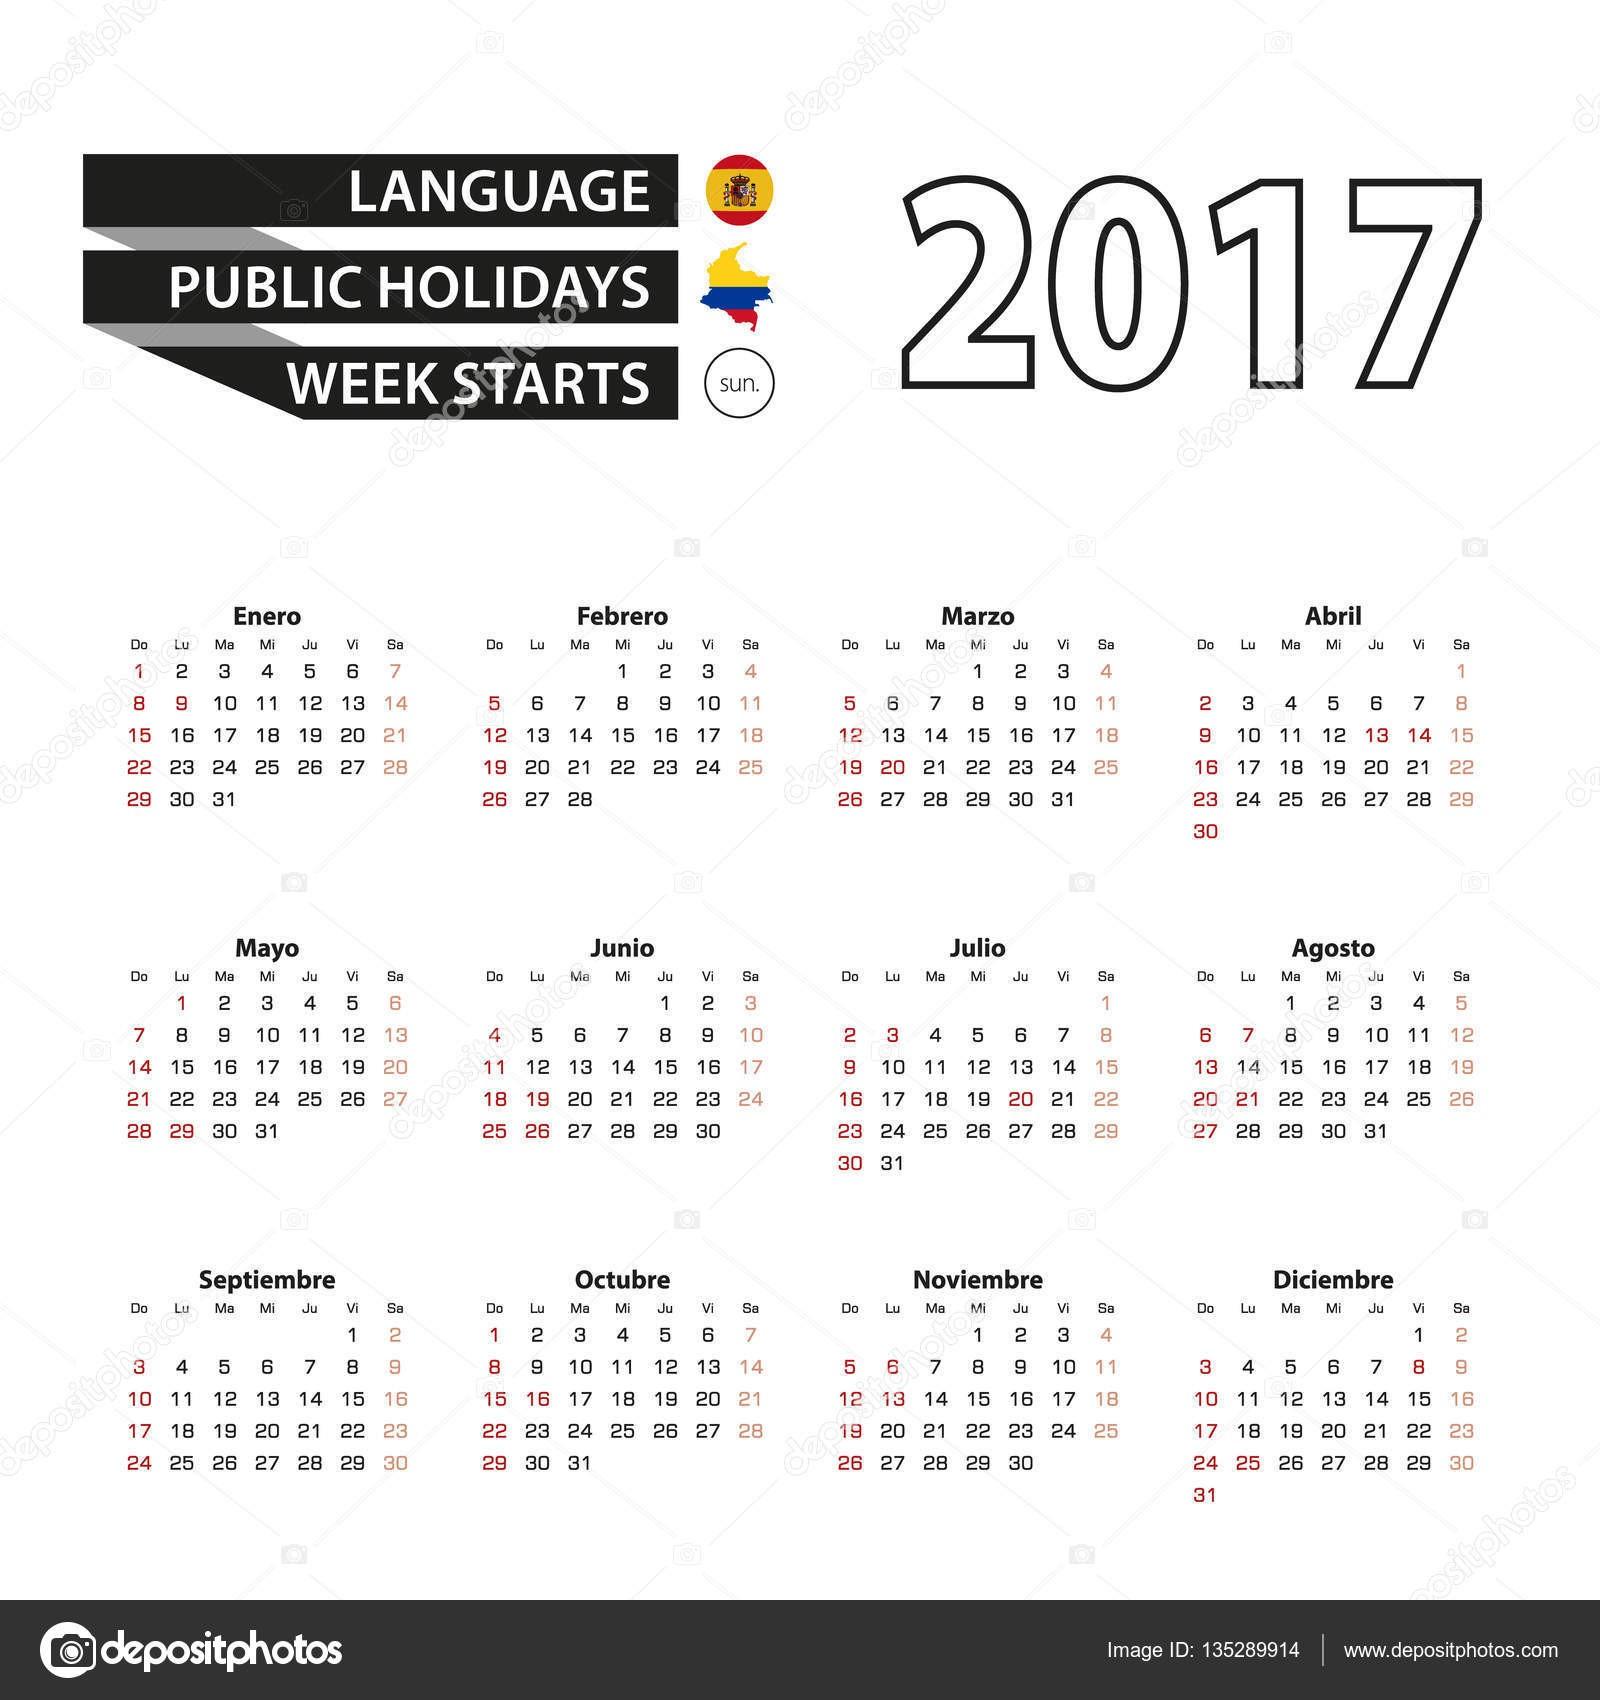 stock illustration calendar 2017 on spanish language